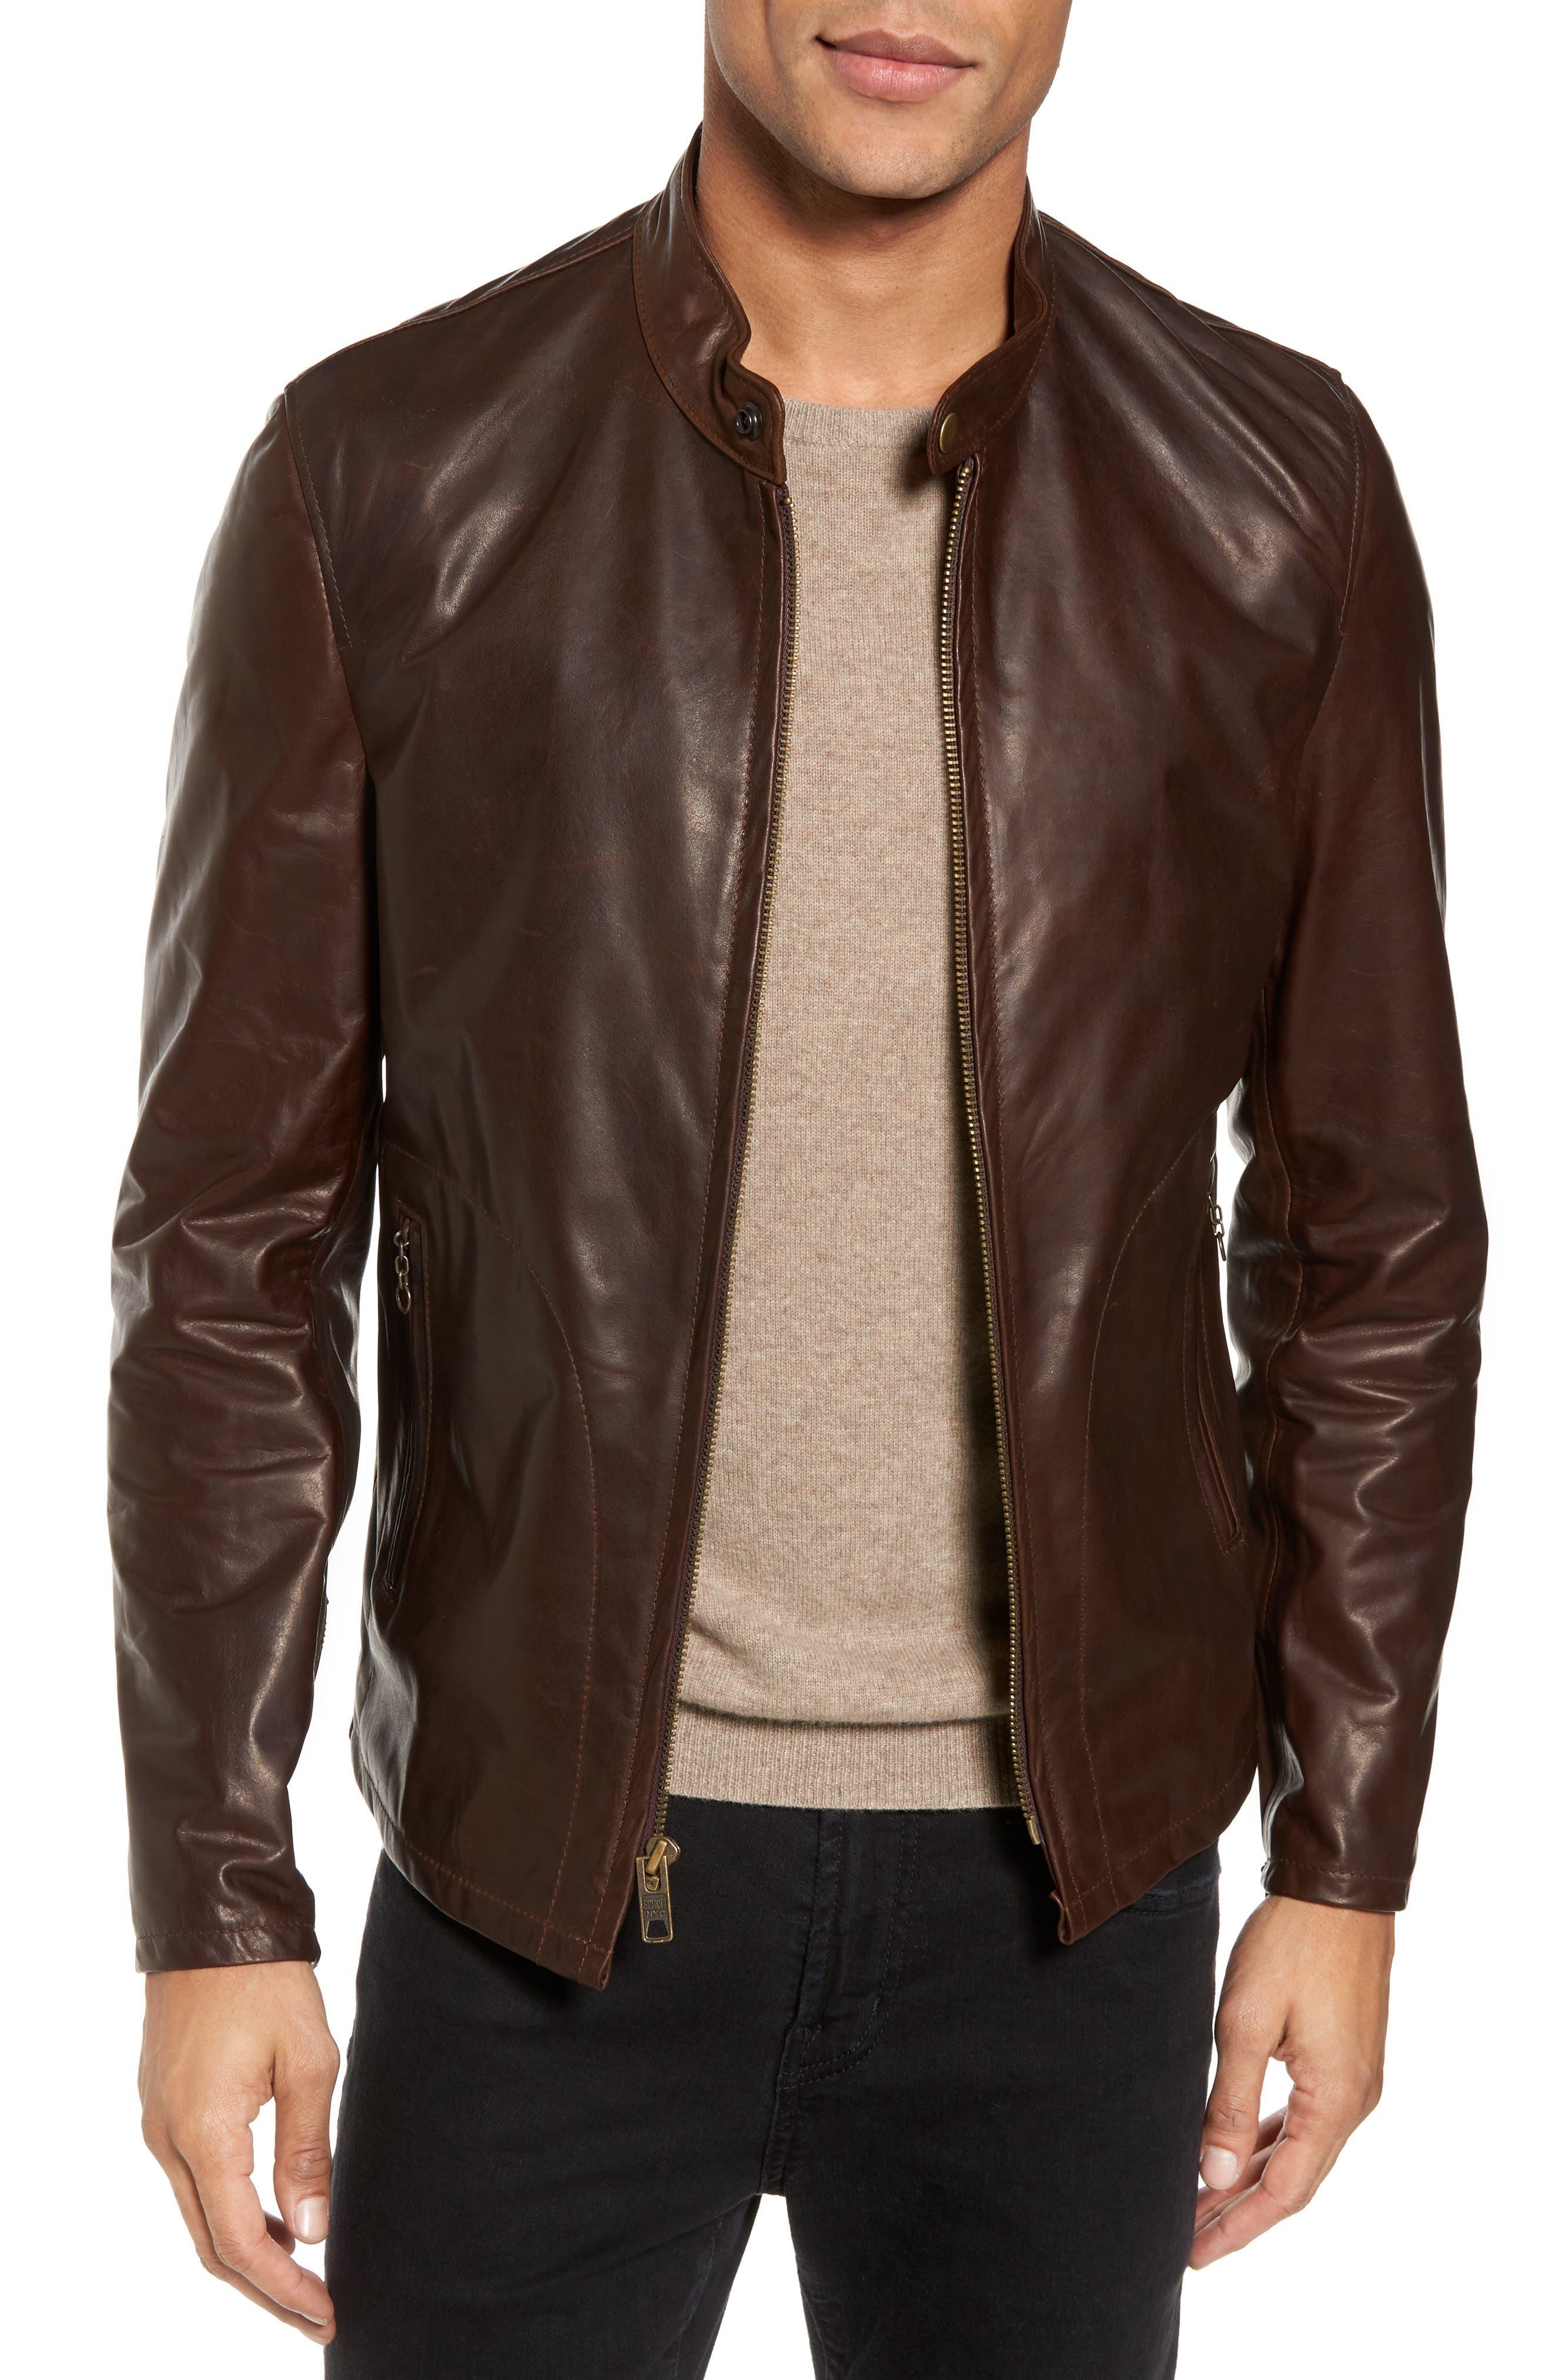 SCHOTT NYC Café Racer Unlined Cowhide Leather Jacket, Main, color, BROWN